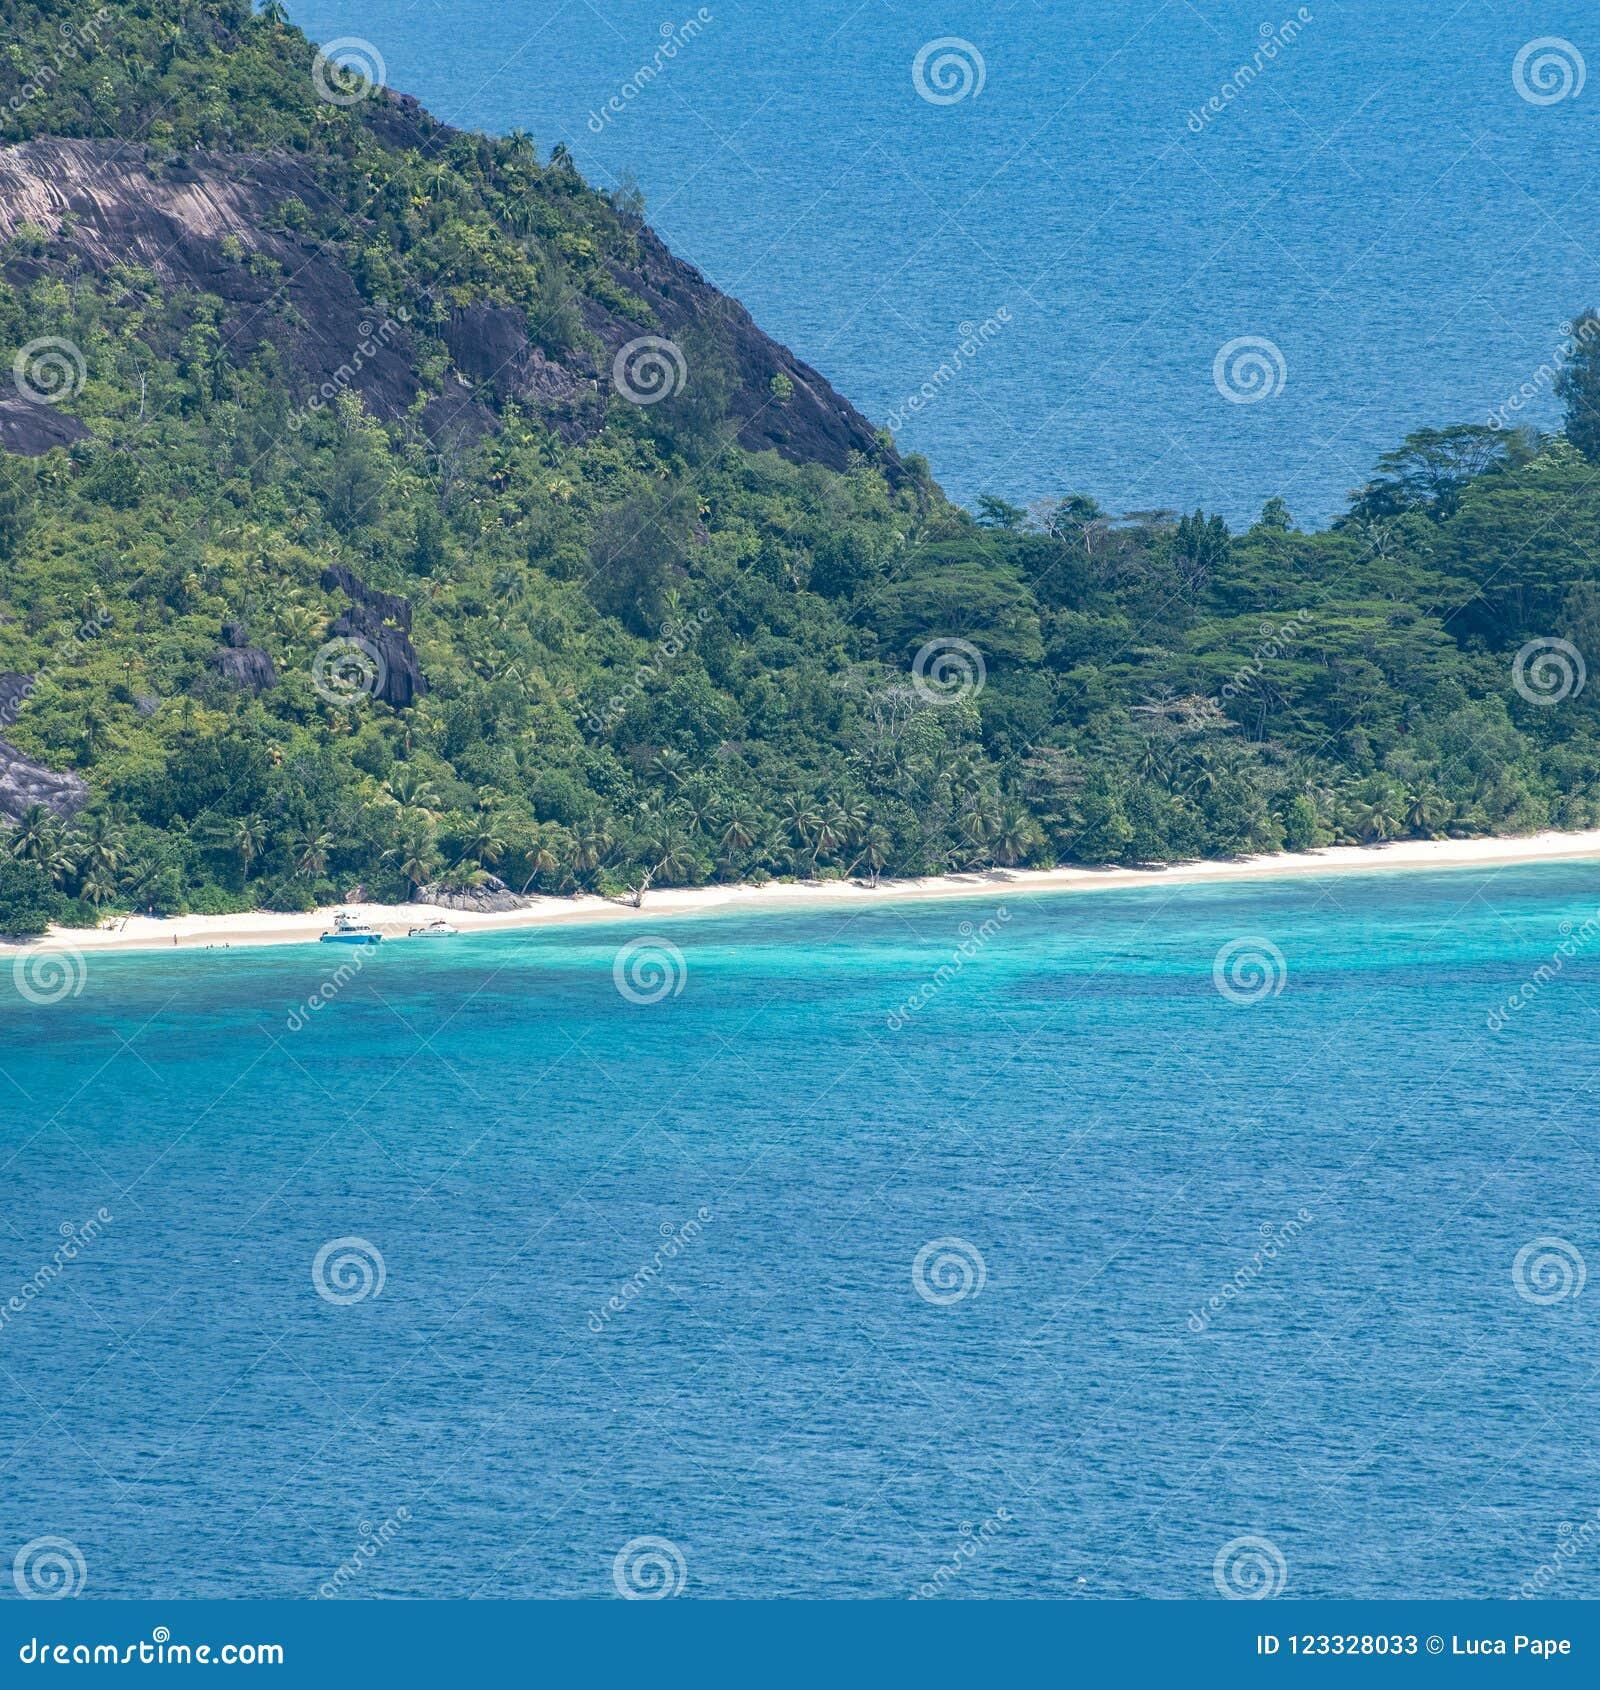 Seychelles Island Beaches: Tropical Island Beach In Seychelles With Boats Stock Image